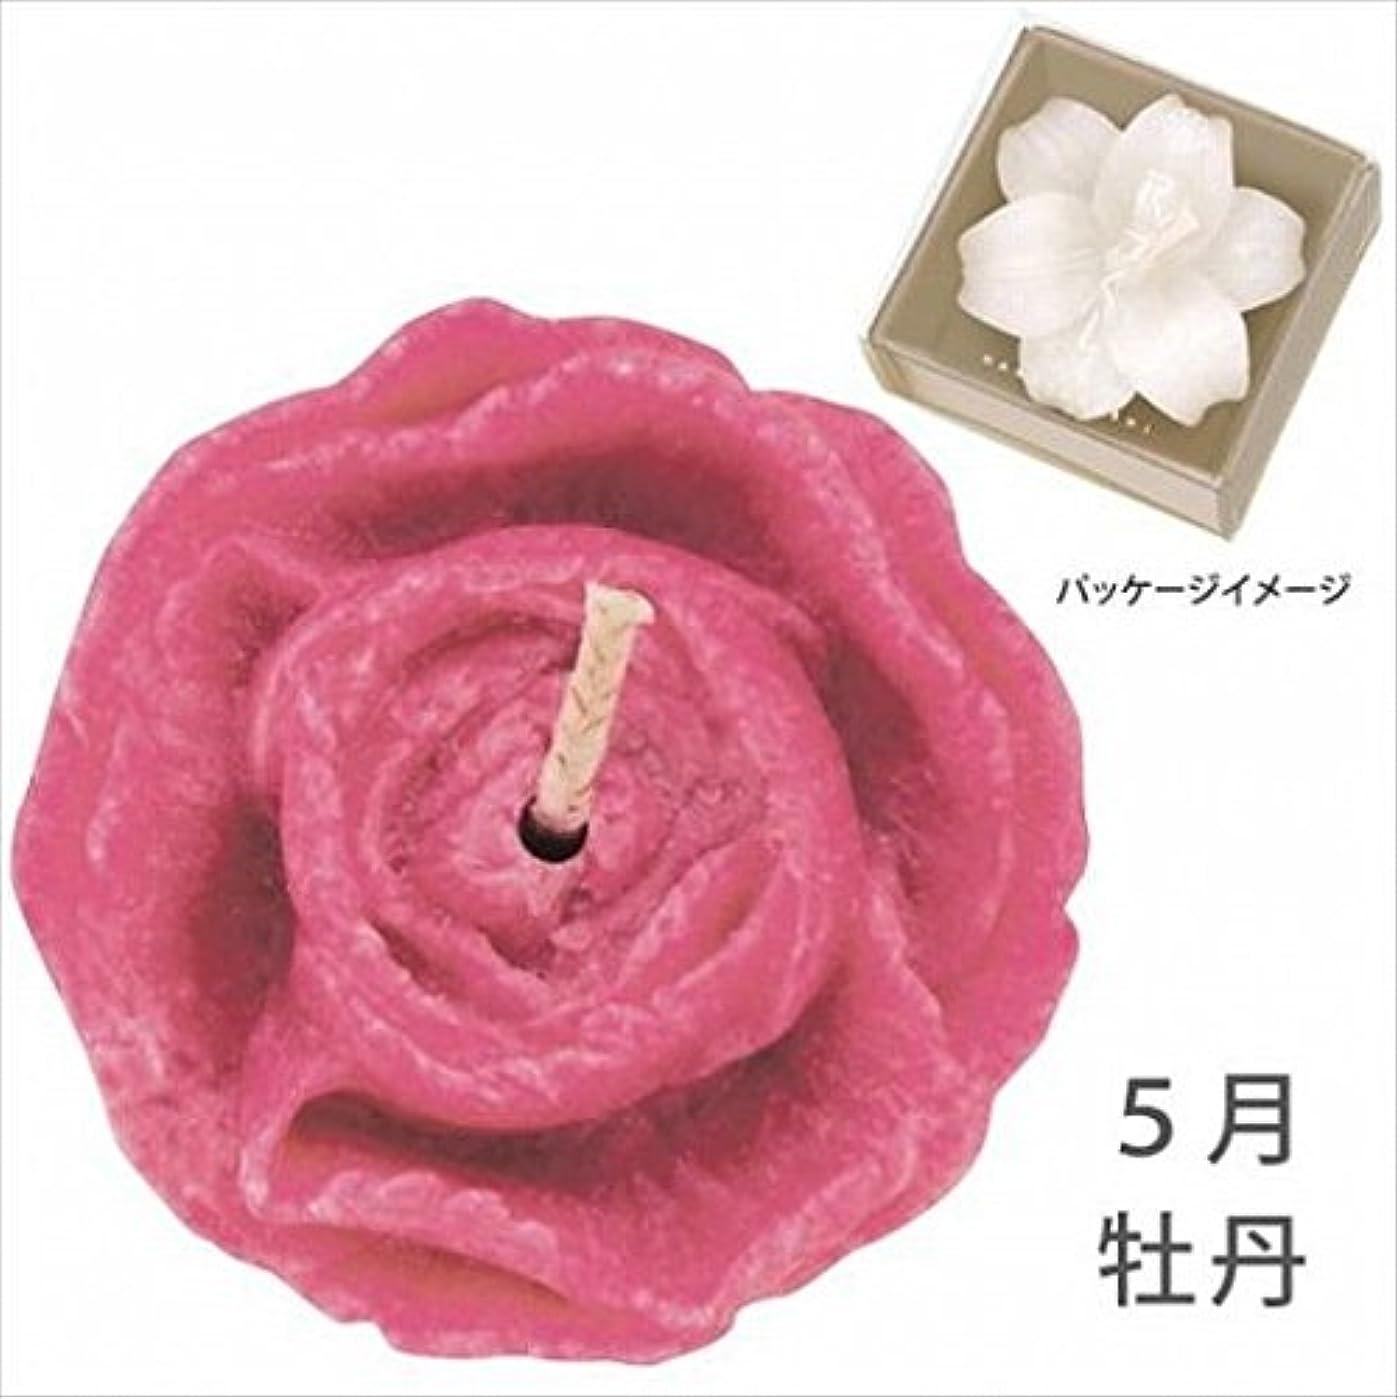 kameyama candle(カメヤマキャンドル) 花づくし(植物性) 牡丹 「 牡丹(5月) 」 キャンドル(A4620590)